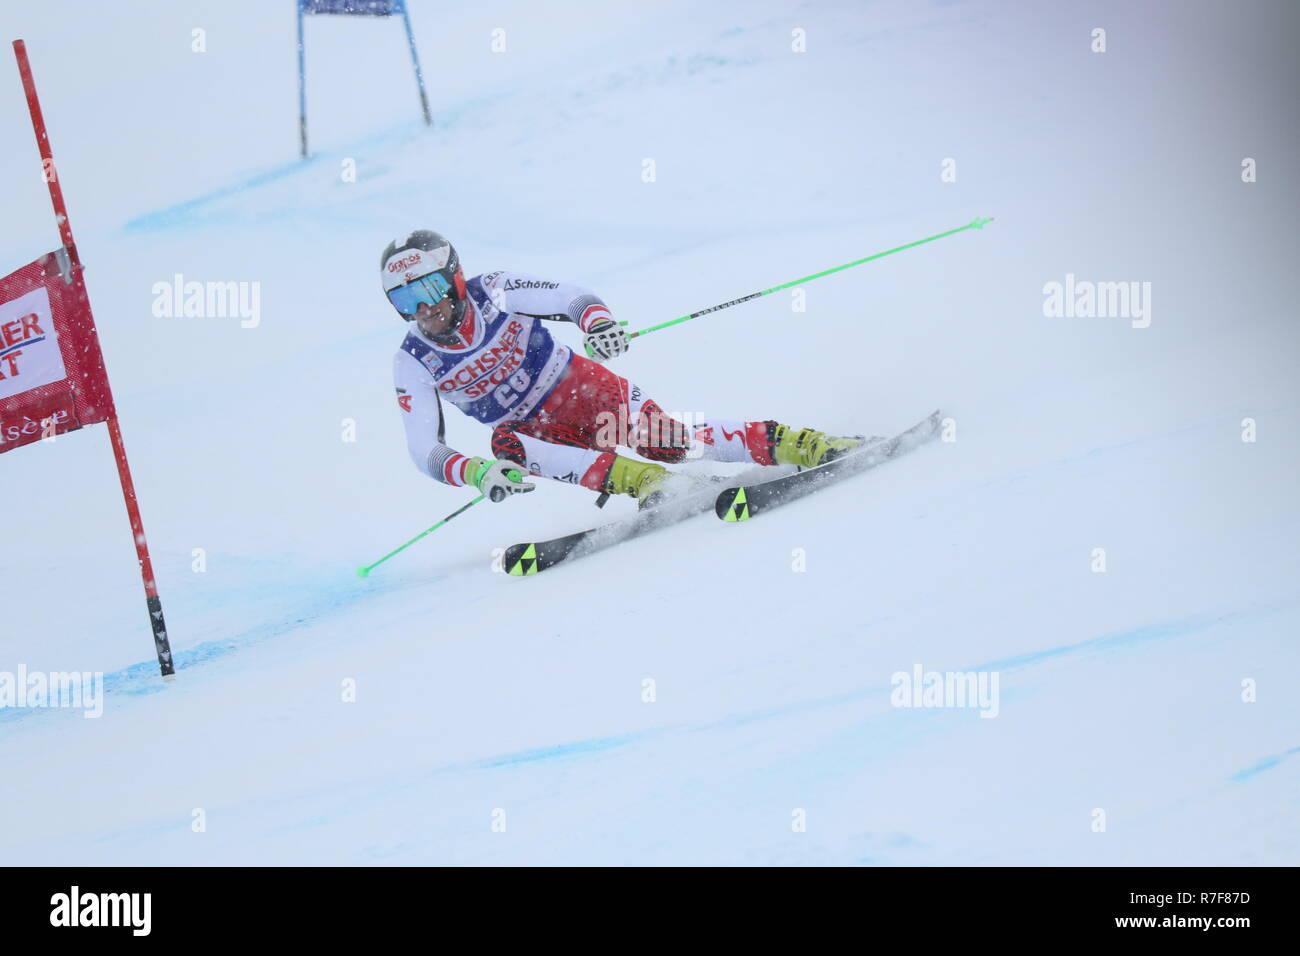 08 Dec. 2018 Val d'Isère, France. Roland Leitinger of Austria skiing men's Giant Slalom Audi FIS Alpine Ski World Cup 2019 Sport WinterSports - Stock Image